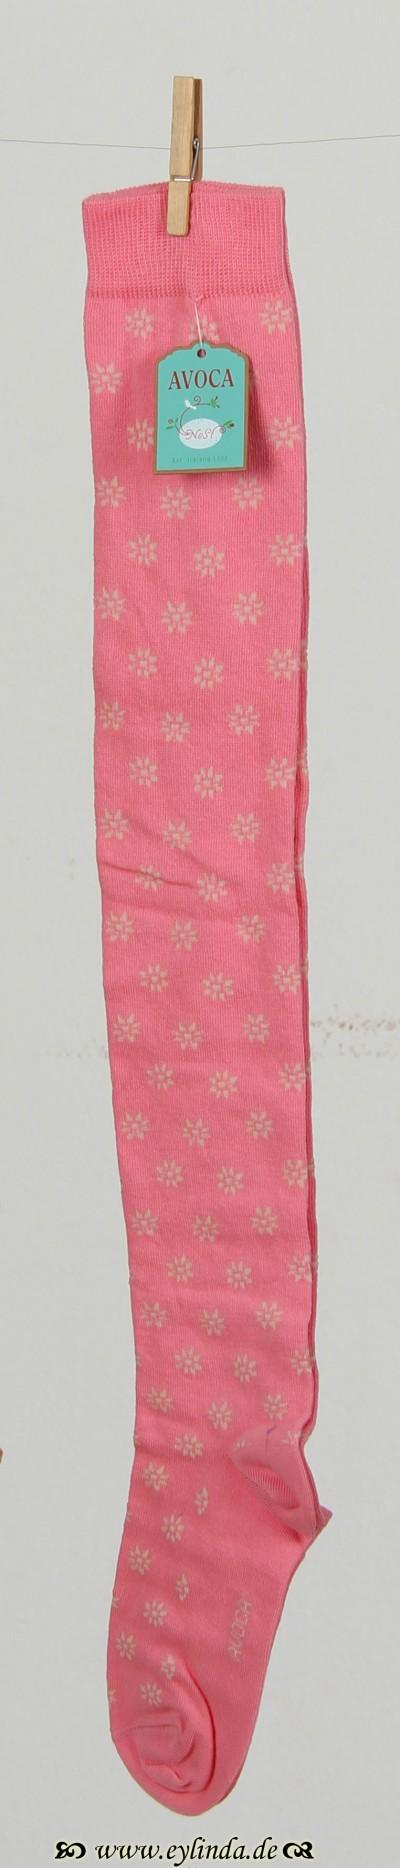 Strümpfe, Fleur-so, bright-pink